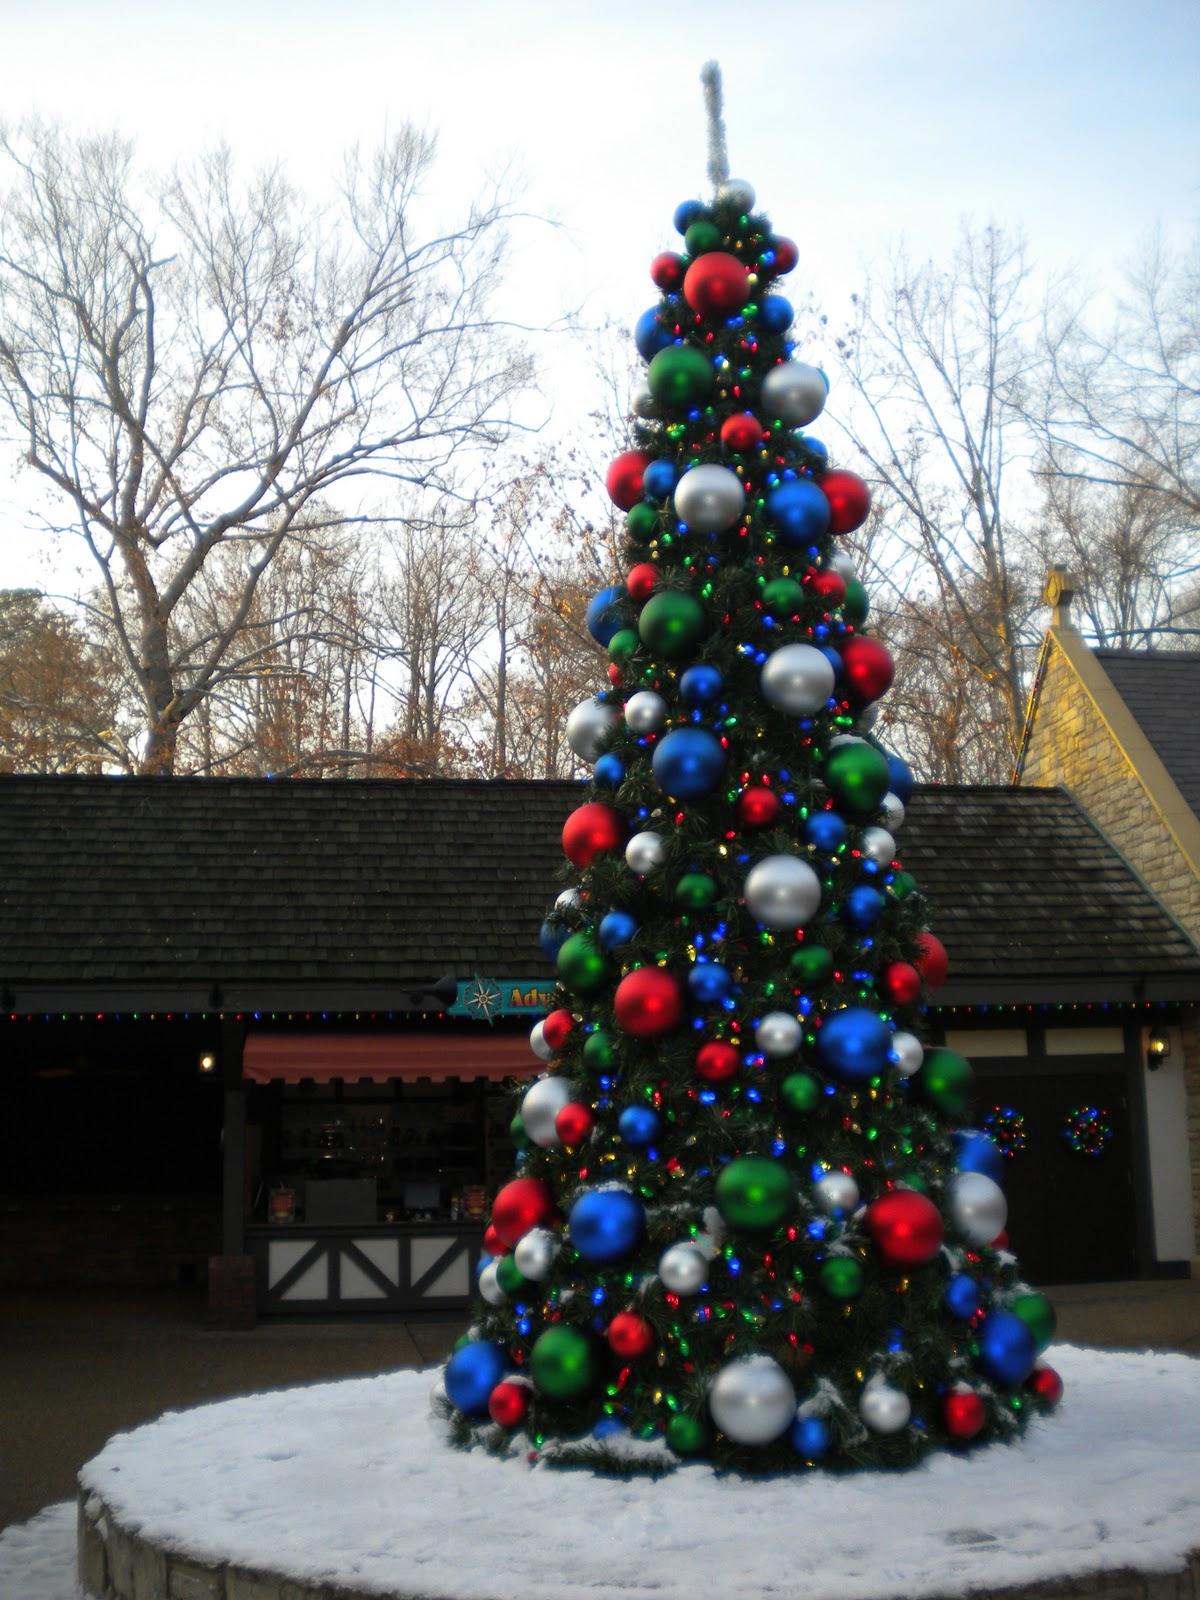 Makeup Fashion And Life Busch Gardens Christmas Town